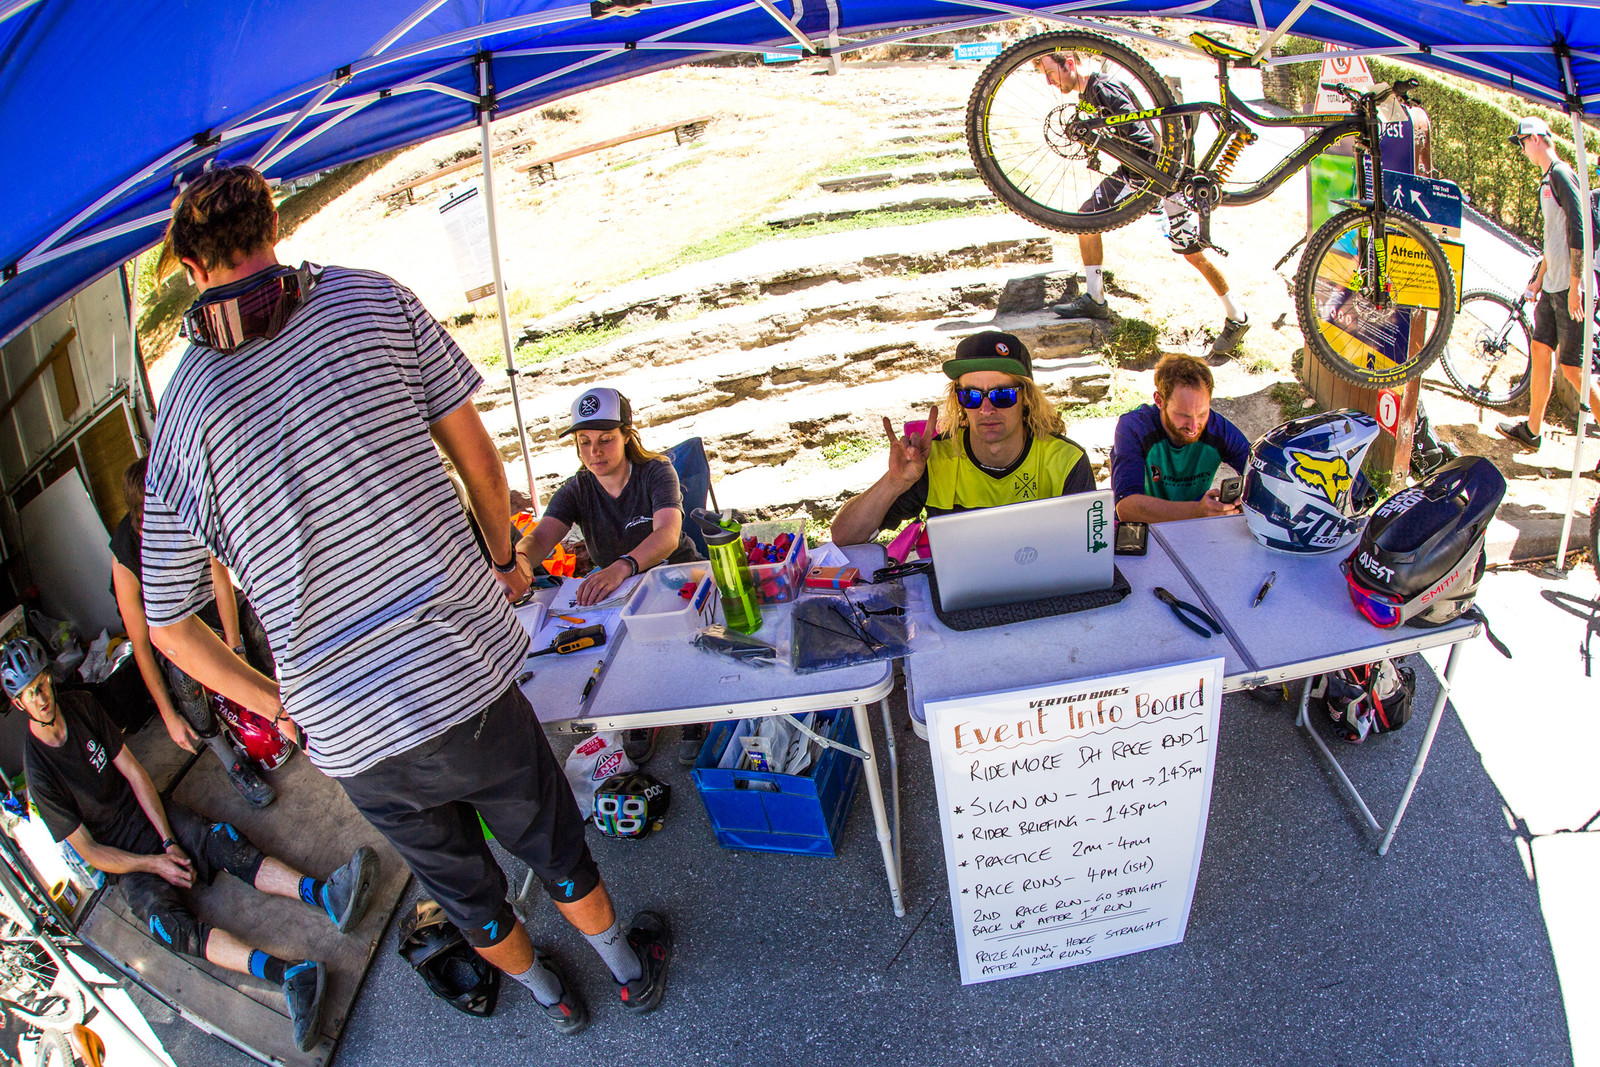 Club Vibe - Homegrown NZ Downhill - Vertigo Bikes Ride More DH Series Race 1 - Mountain Biking Pictures - Vital MTB